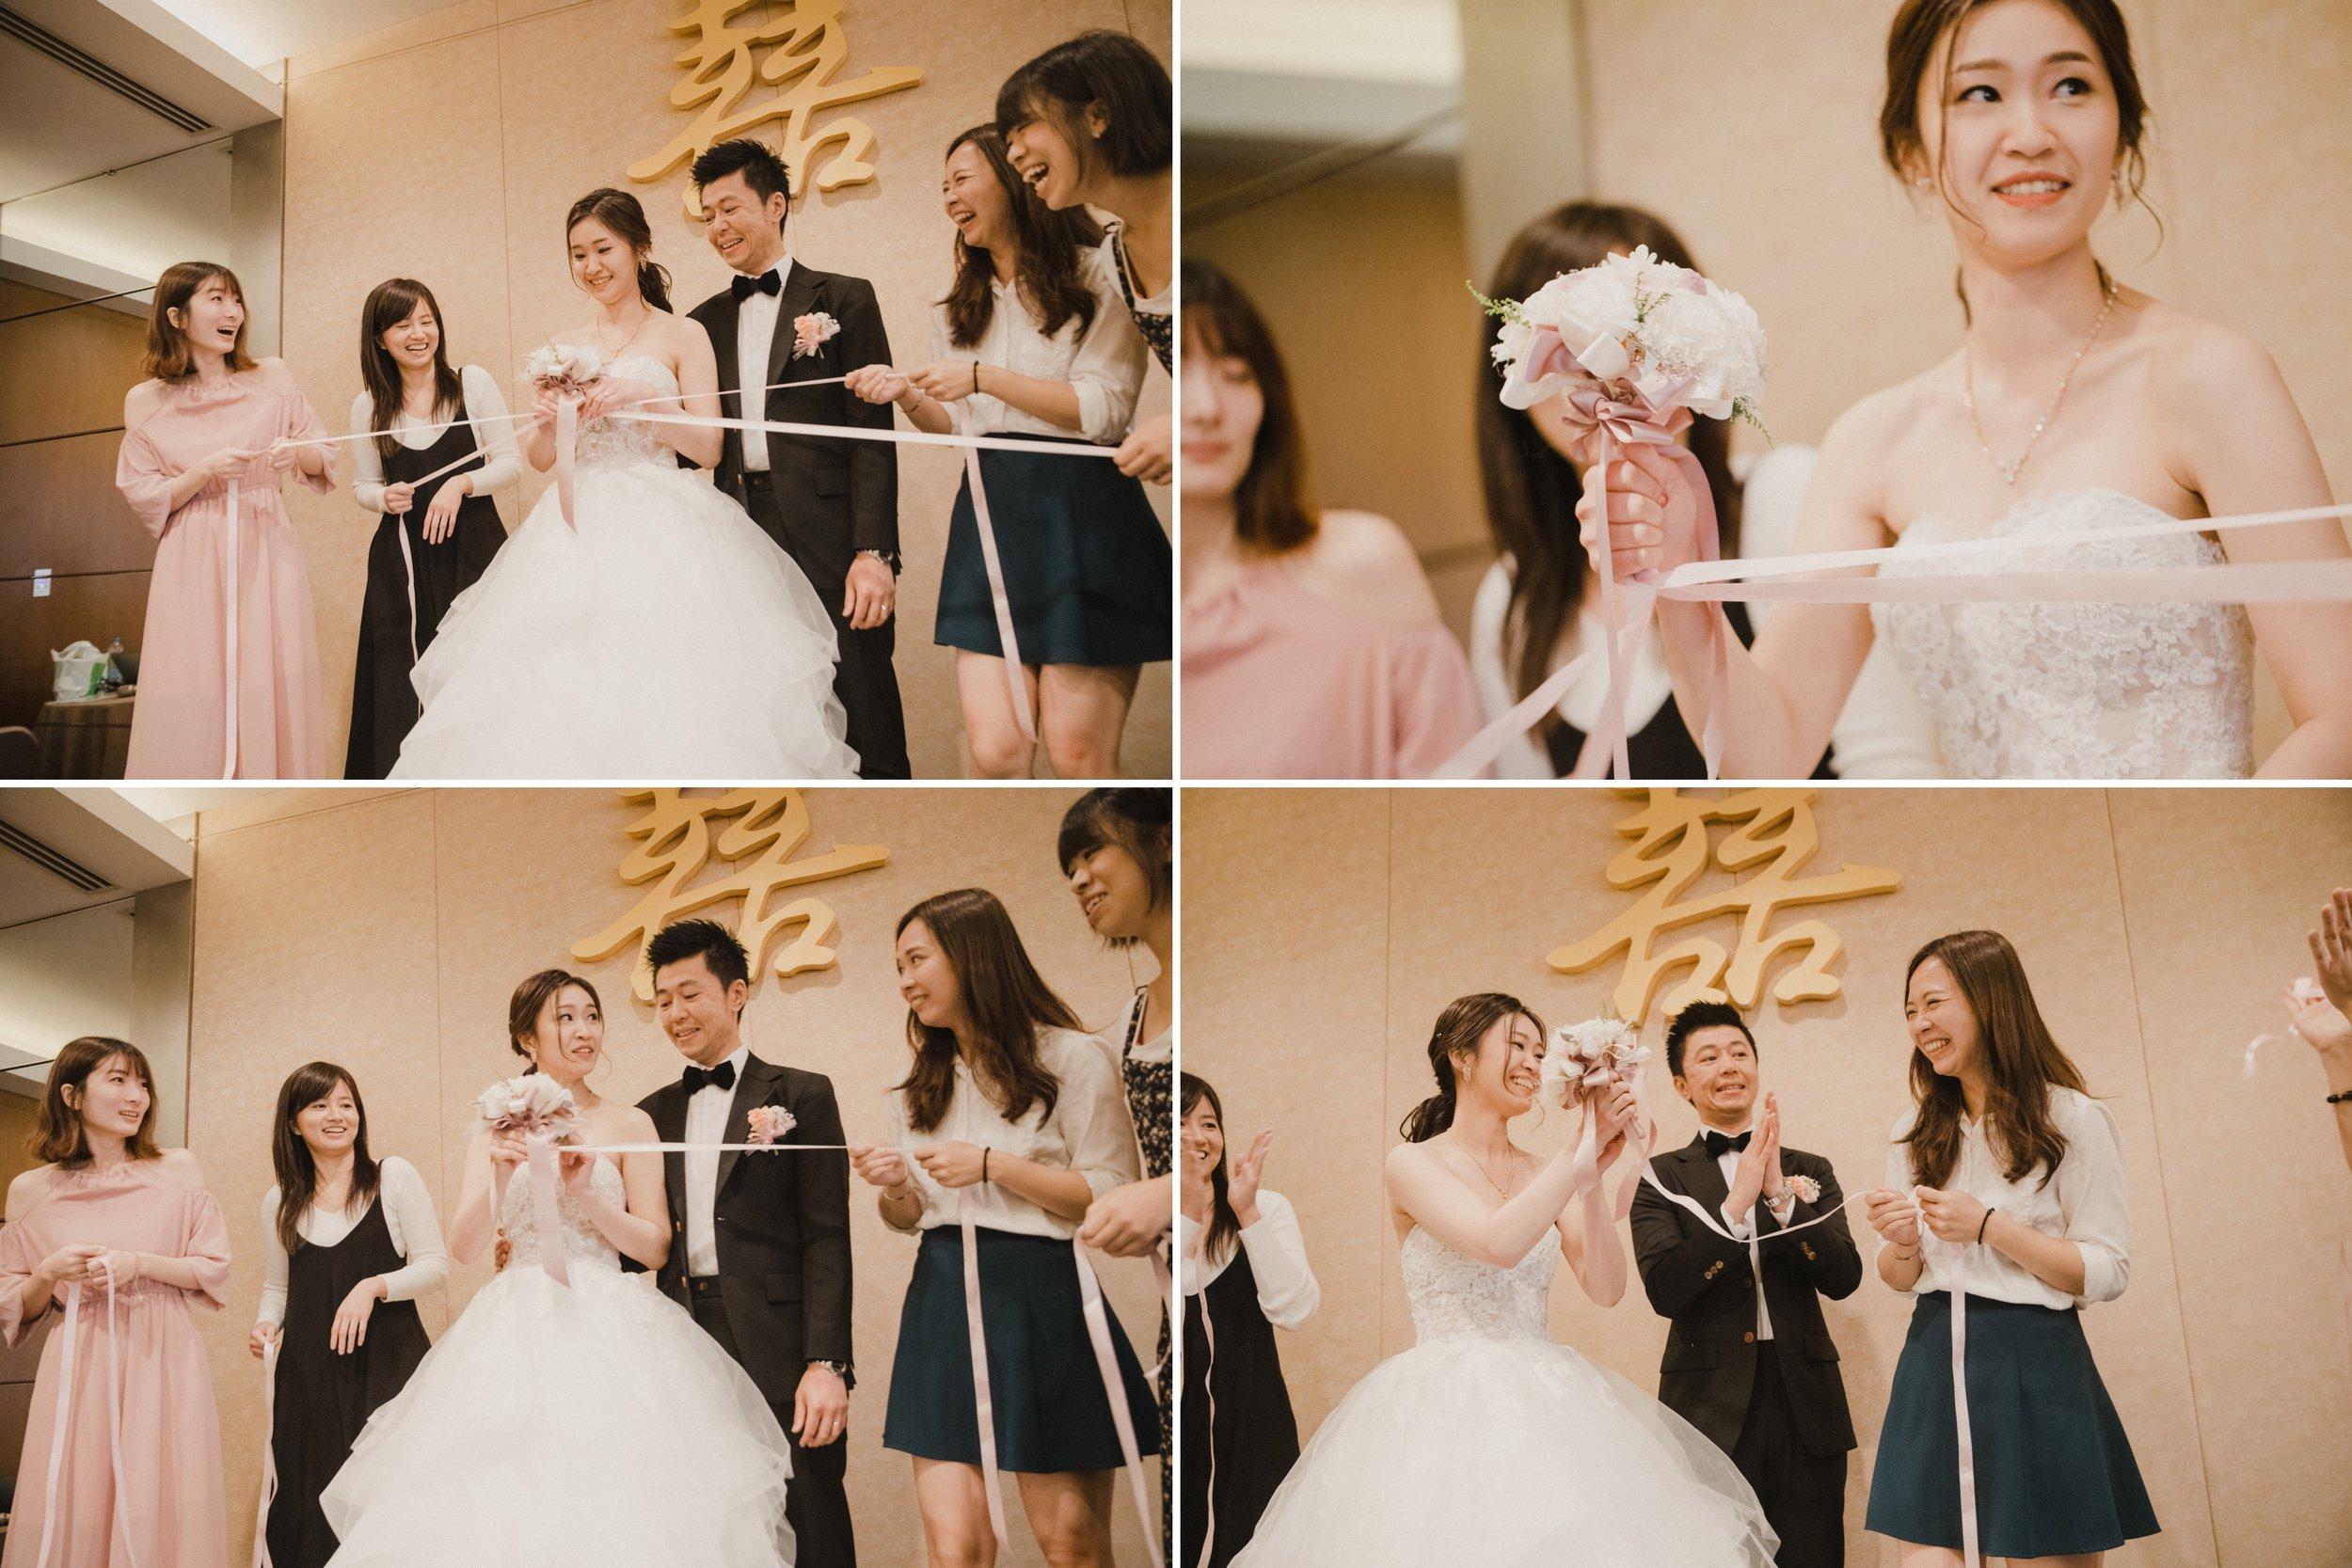 wedding-caridee-oscar-lunch-ambassador-hsinchu-結婚午宴-新竹國賓_113.jpg